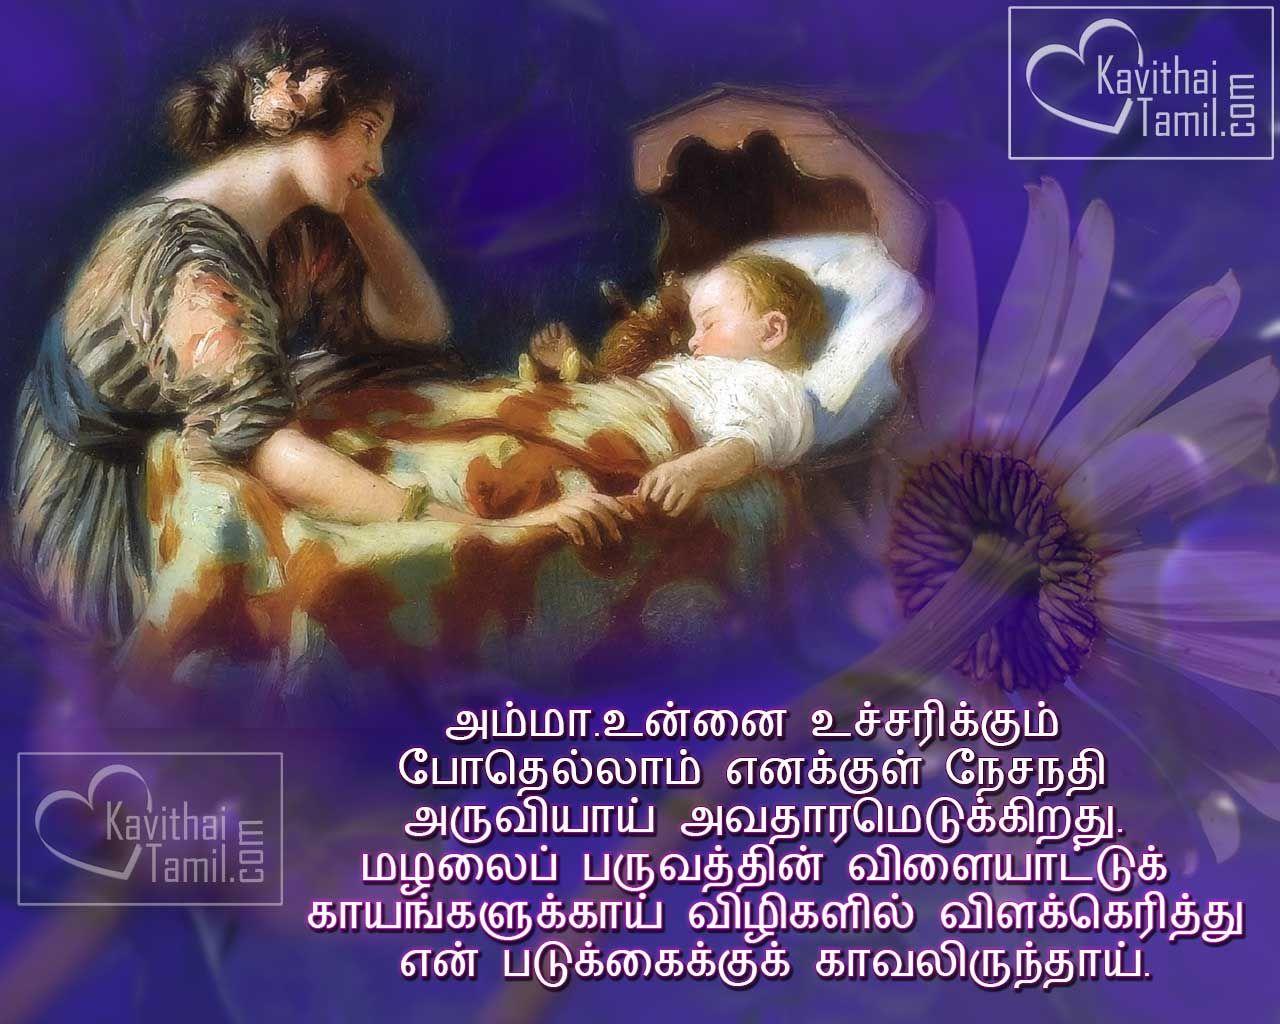 Amma Paasam Tamil Kavithai Wallpapers Free Download